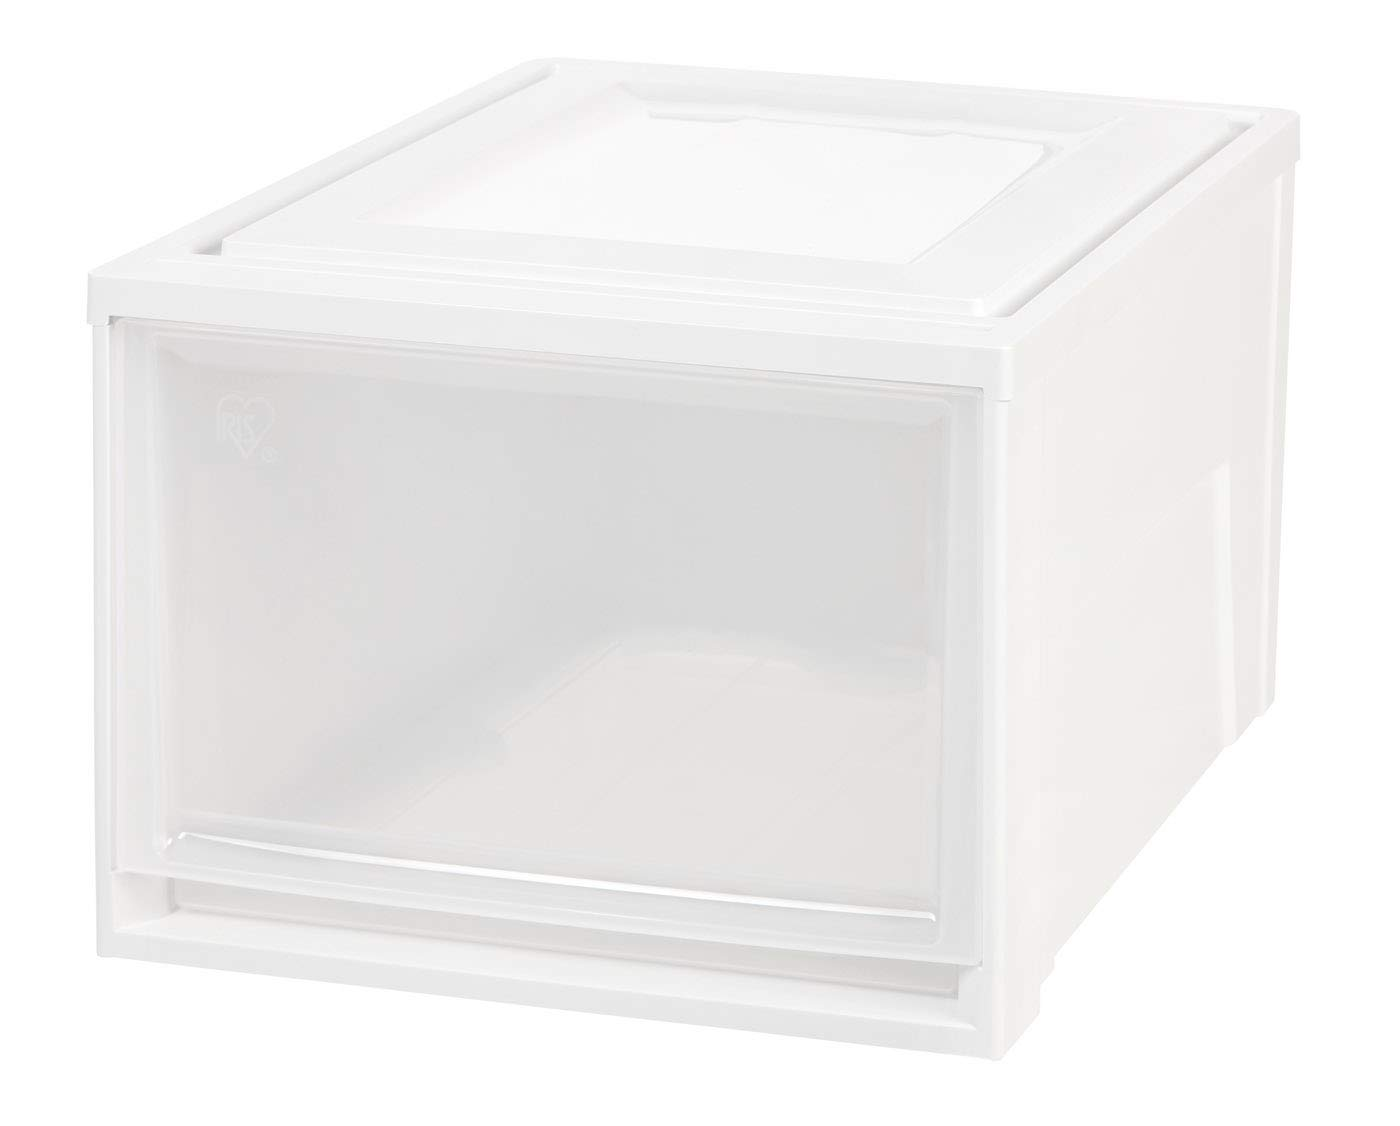 Amazon.com: IRIS Caja profunda cajón de pecho, color blanco ...